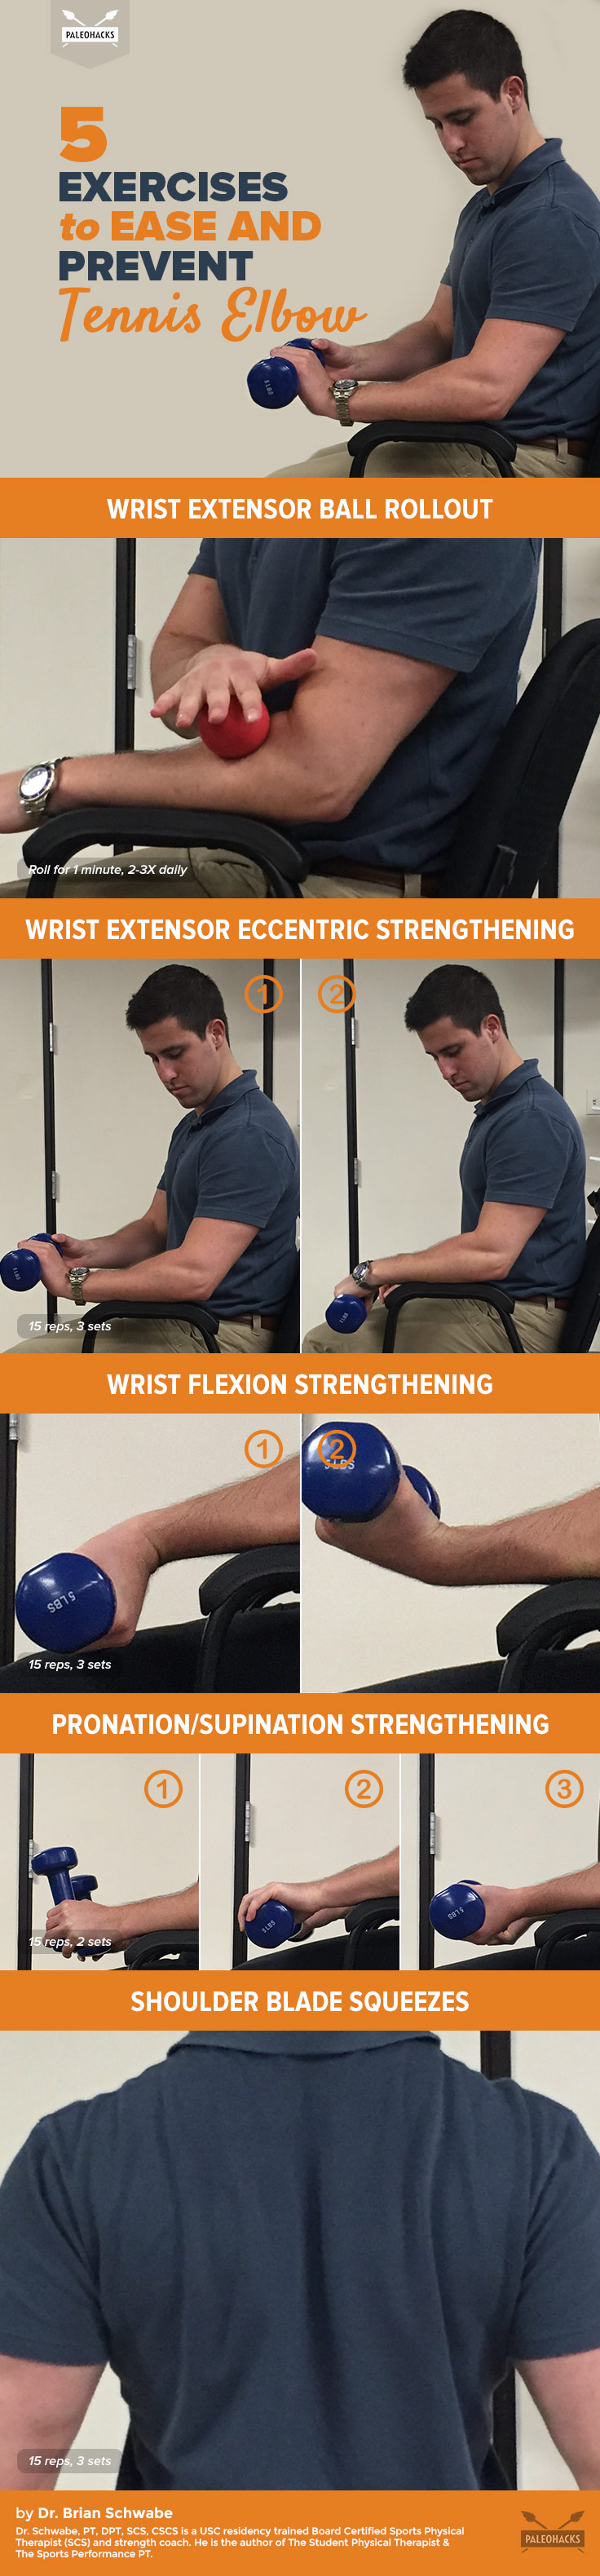 5 Exercises to Treat Tennis Elbow | Tendinite bras ...